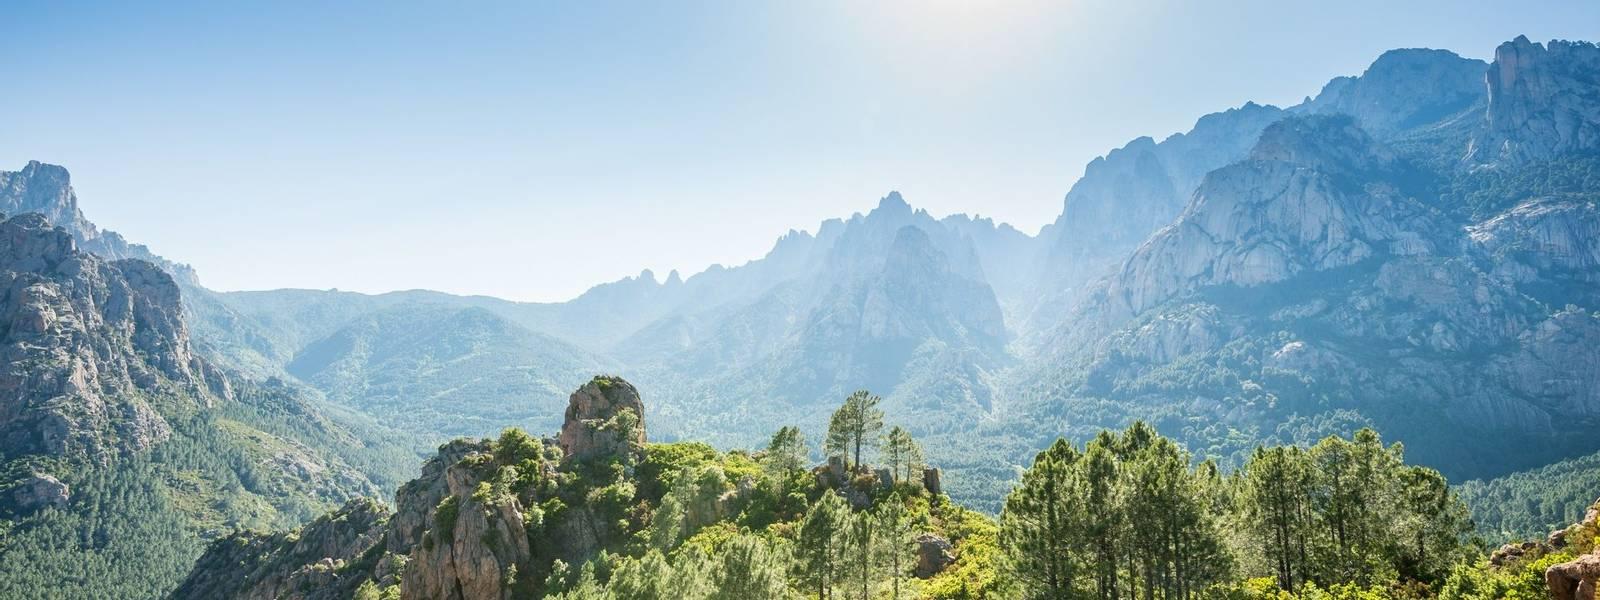 France - Corsica - AdobeStock_151078562.jpeg